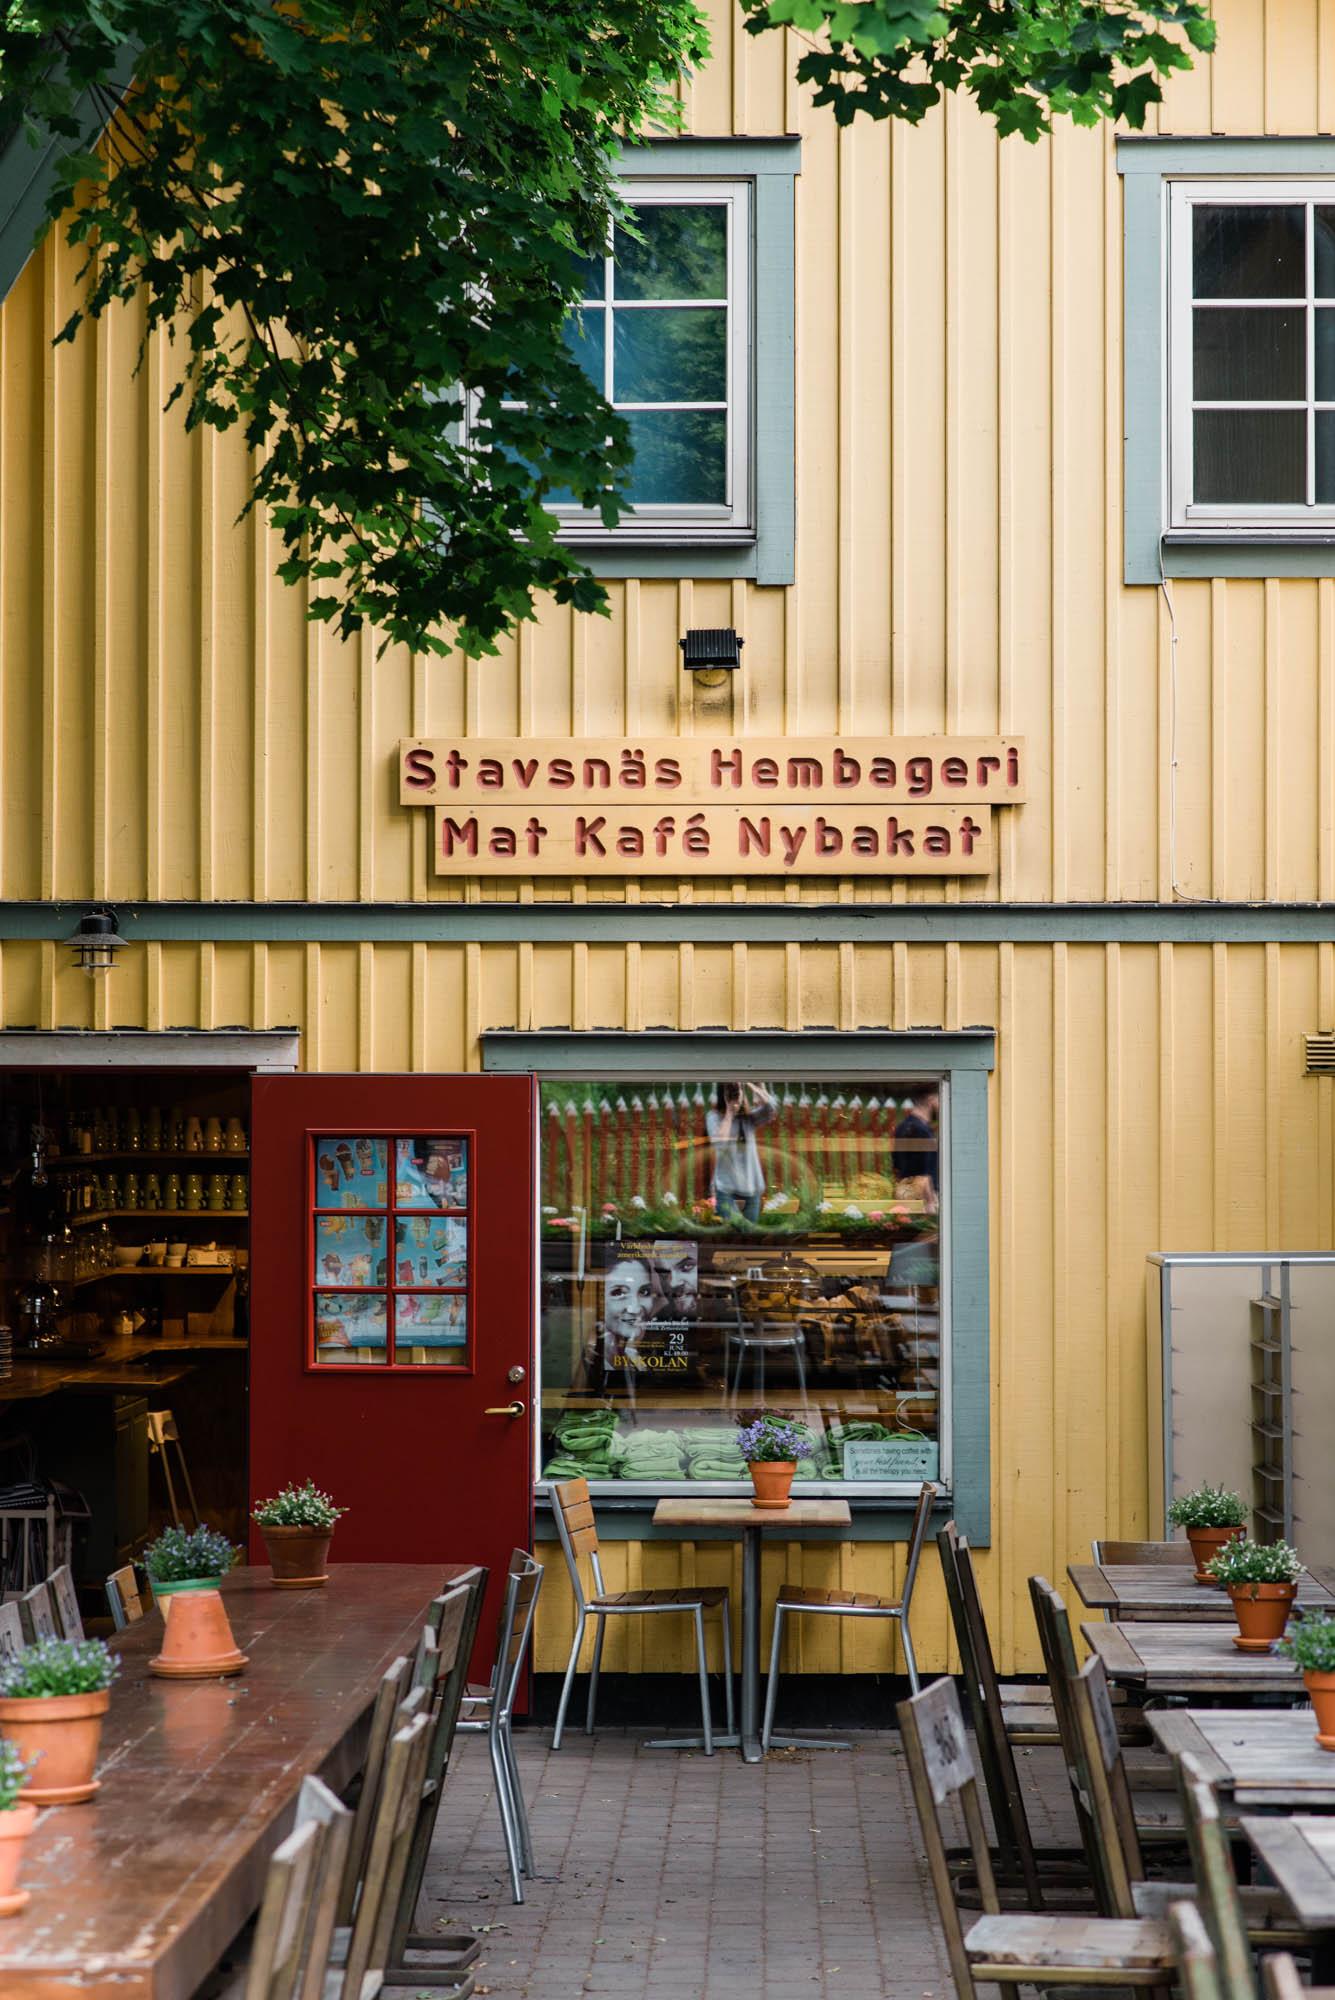 Web-hannah puechmarin-sweden-9077.jpg